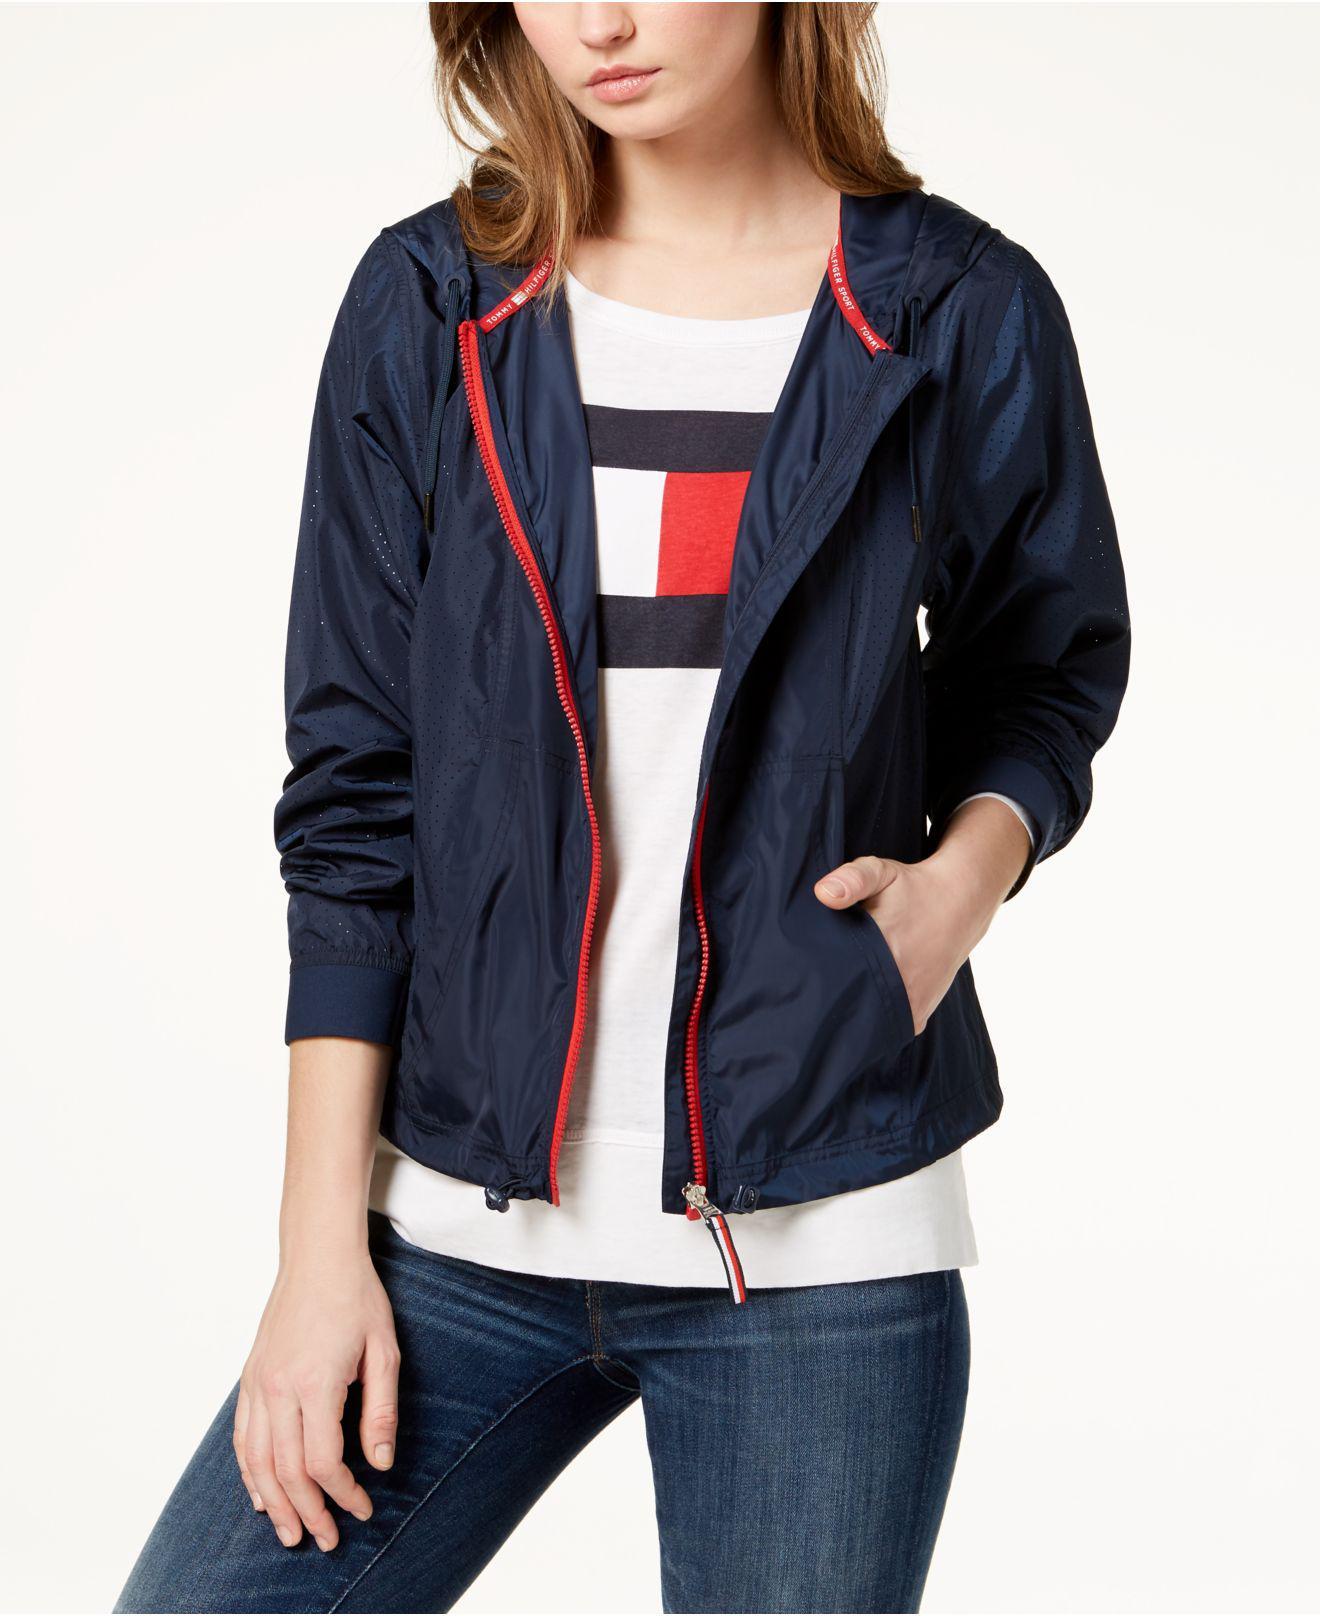 huippumuoti Yhdistynyt kuningaskunta tehdashinta Sport Hooded Jacket, Created For Macy's